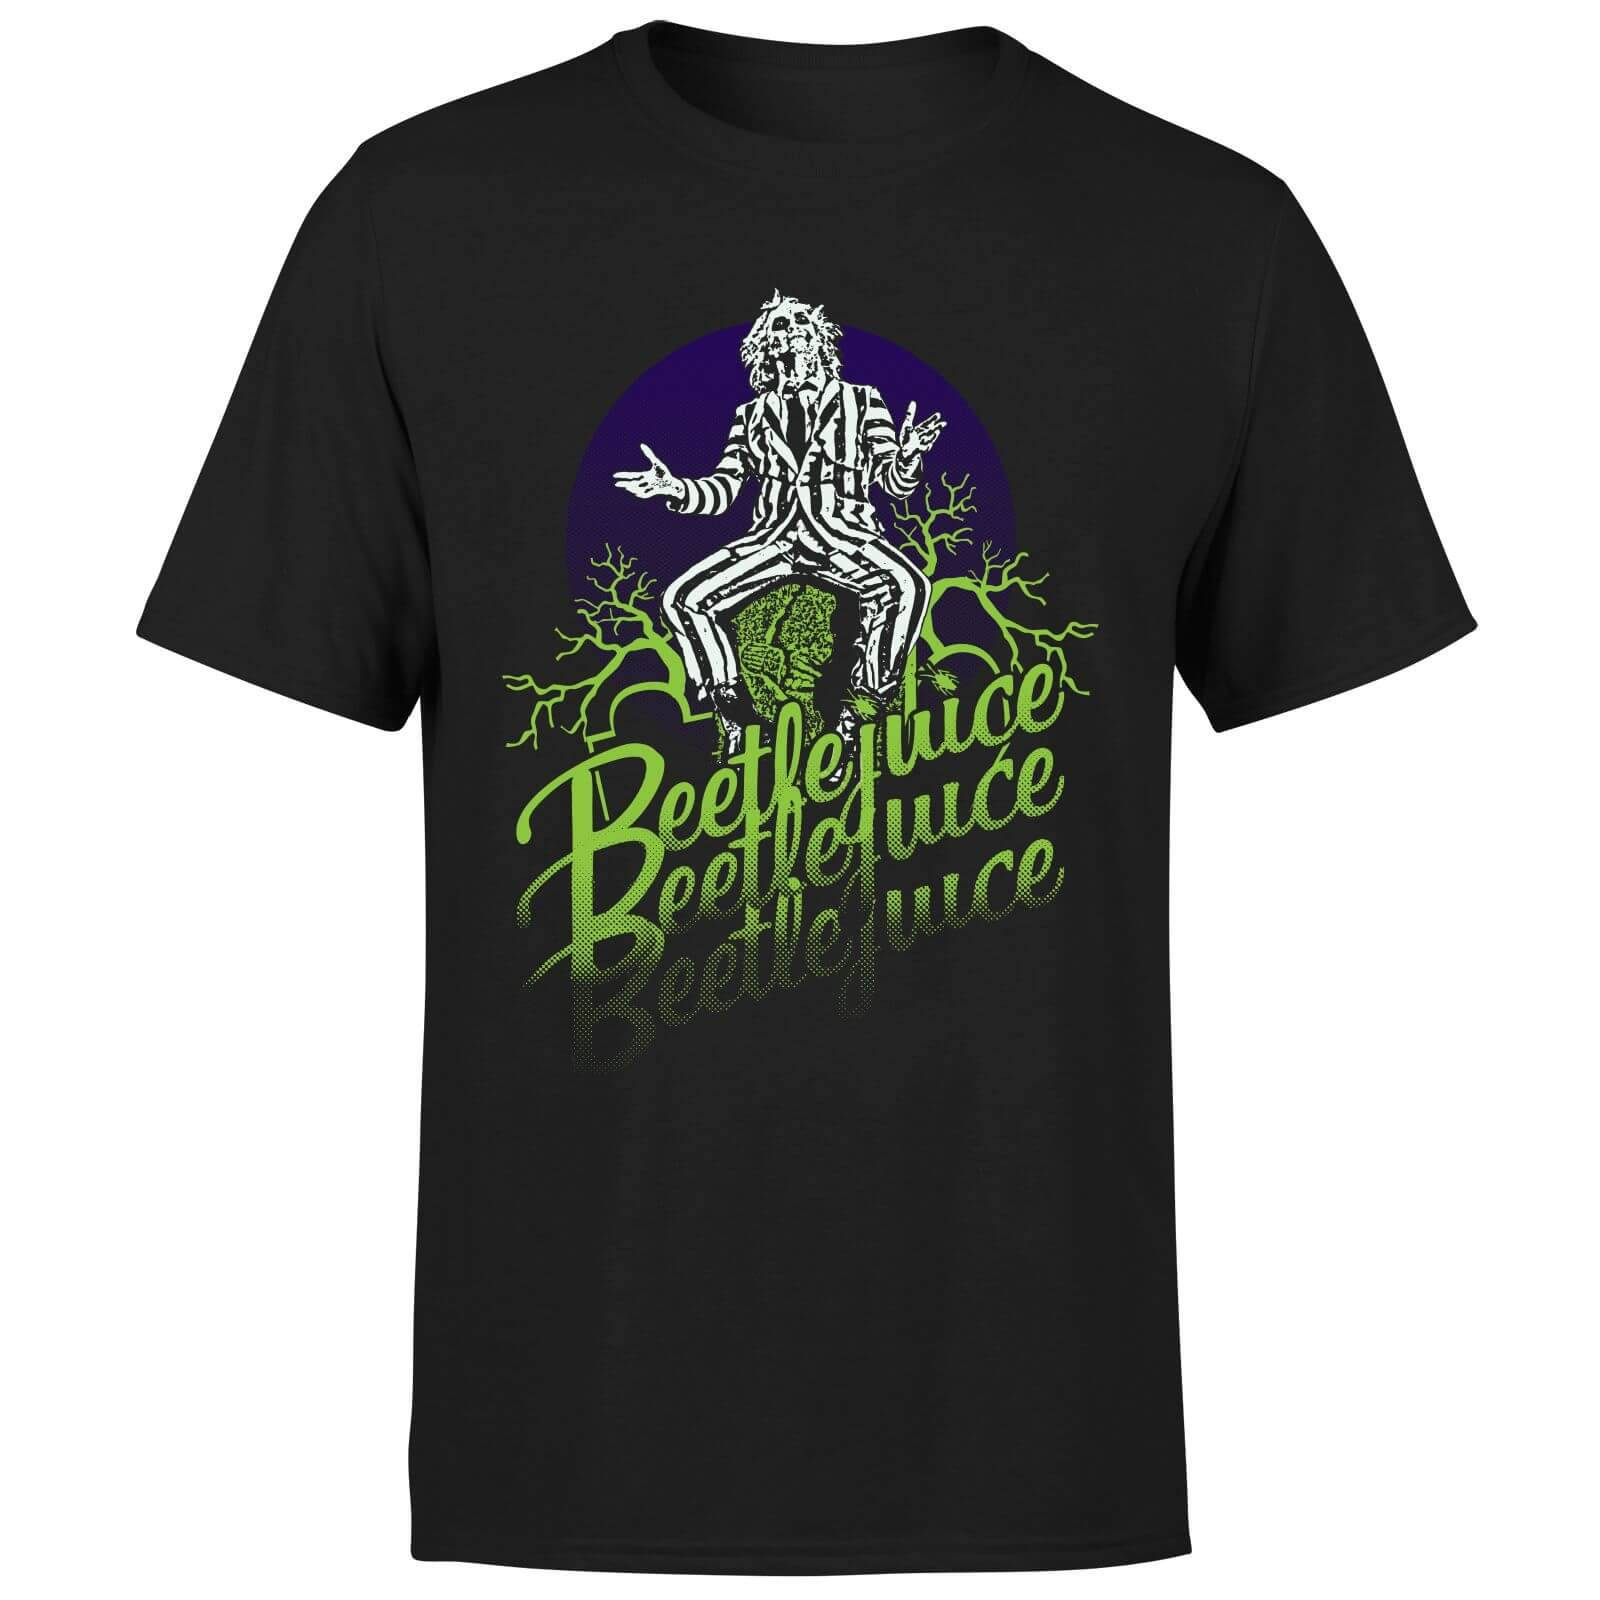 Beetlejuice T-Shirt Homme Beetlejuice Abîmé - Noir - XXL - Noir